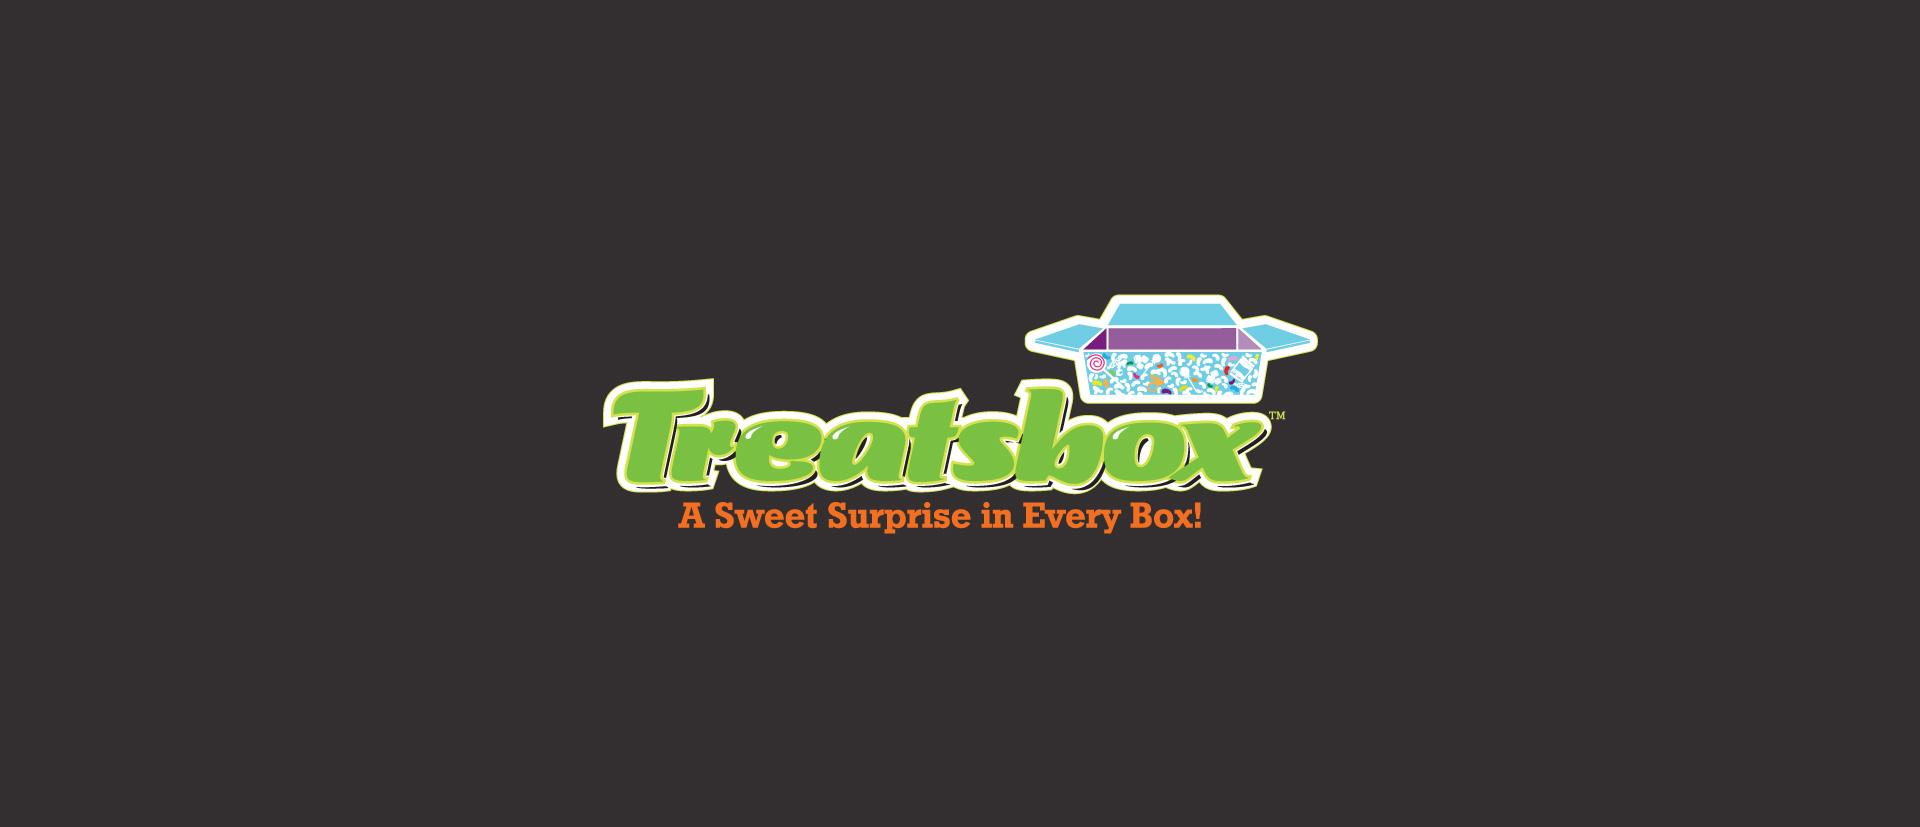 Treatsbox Branding and Identity